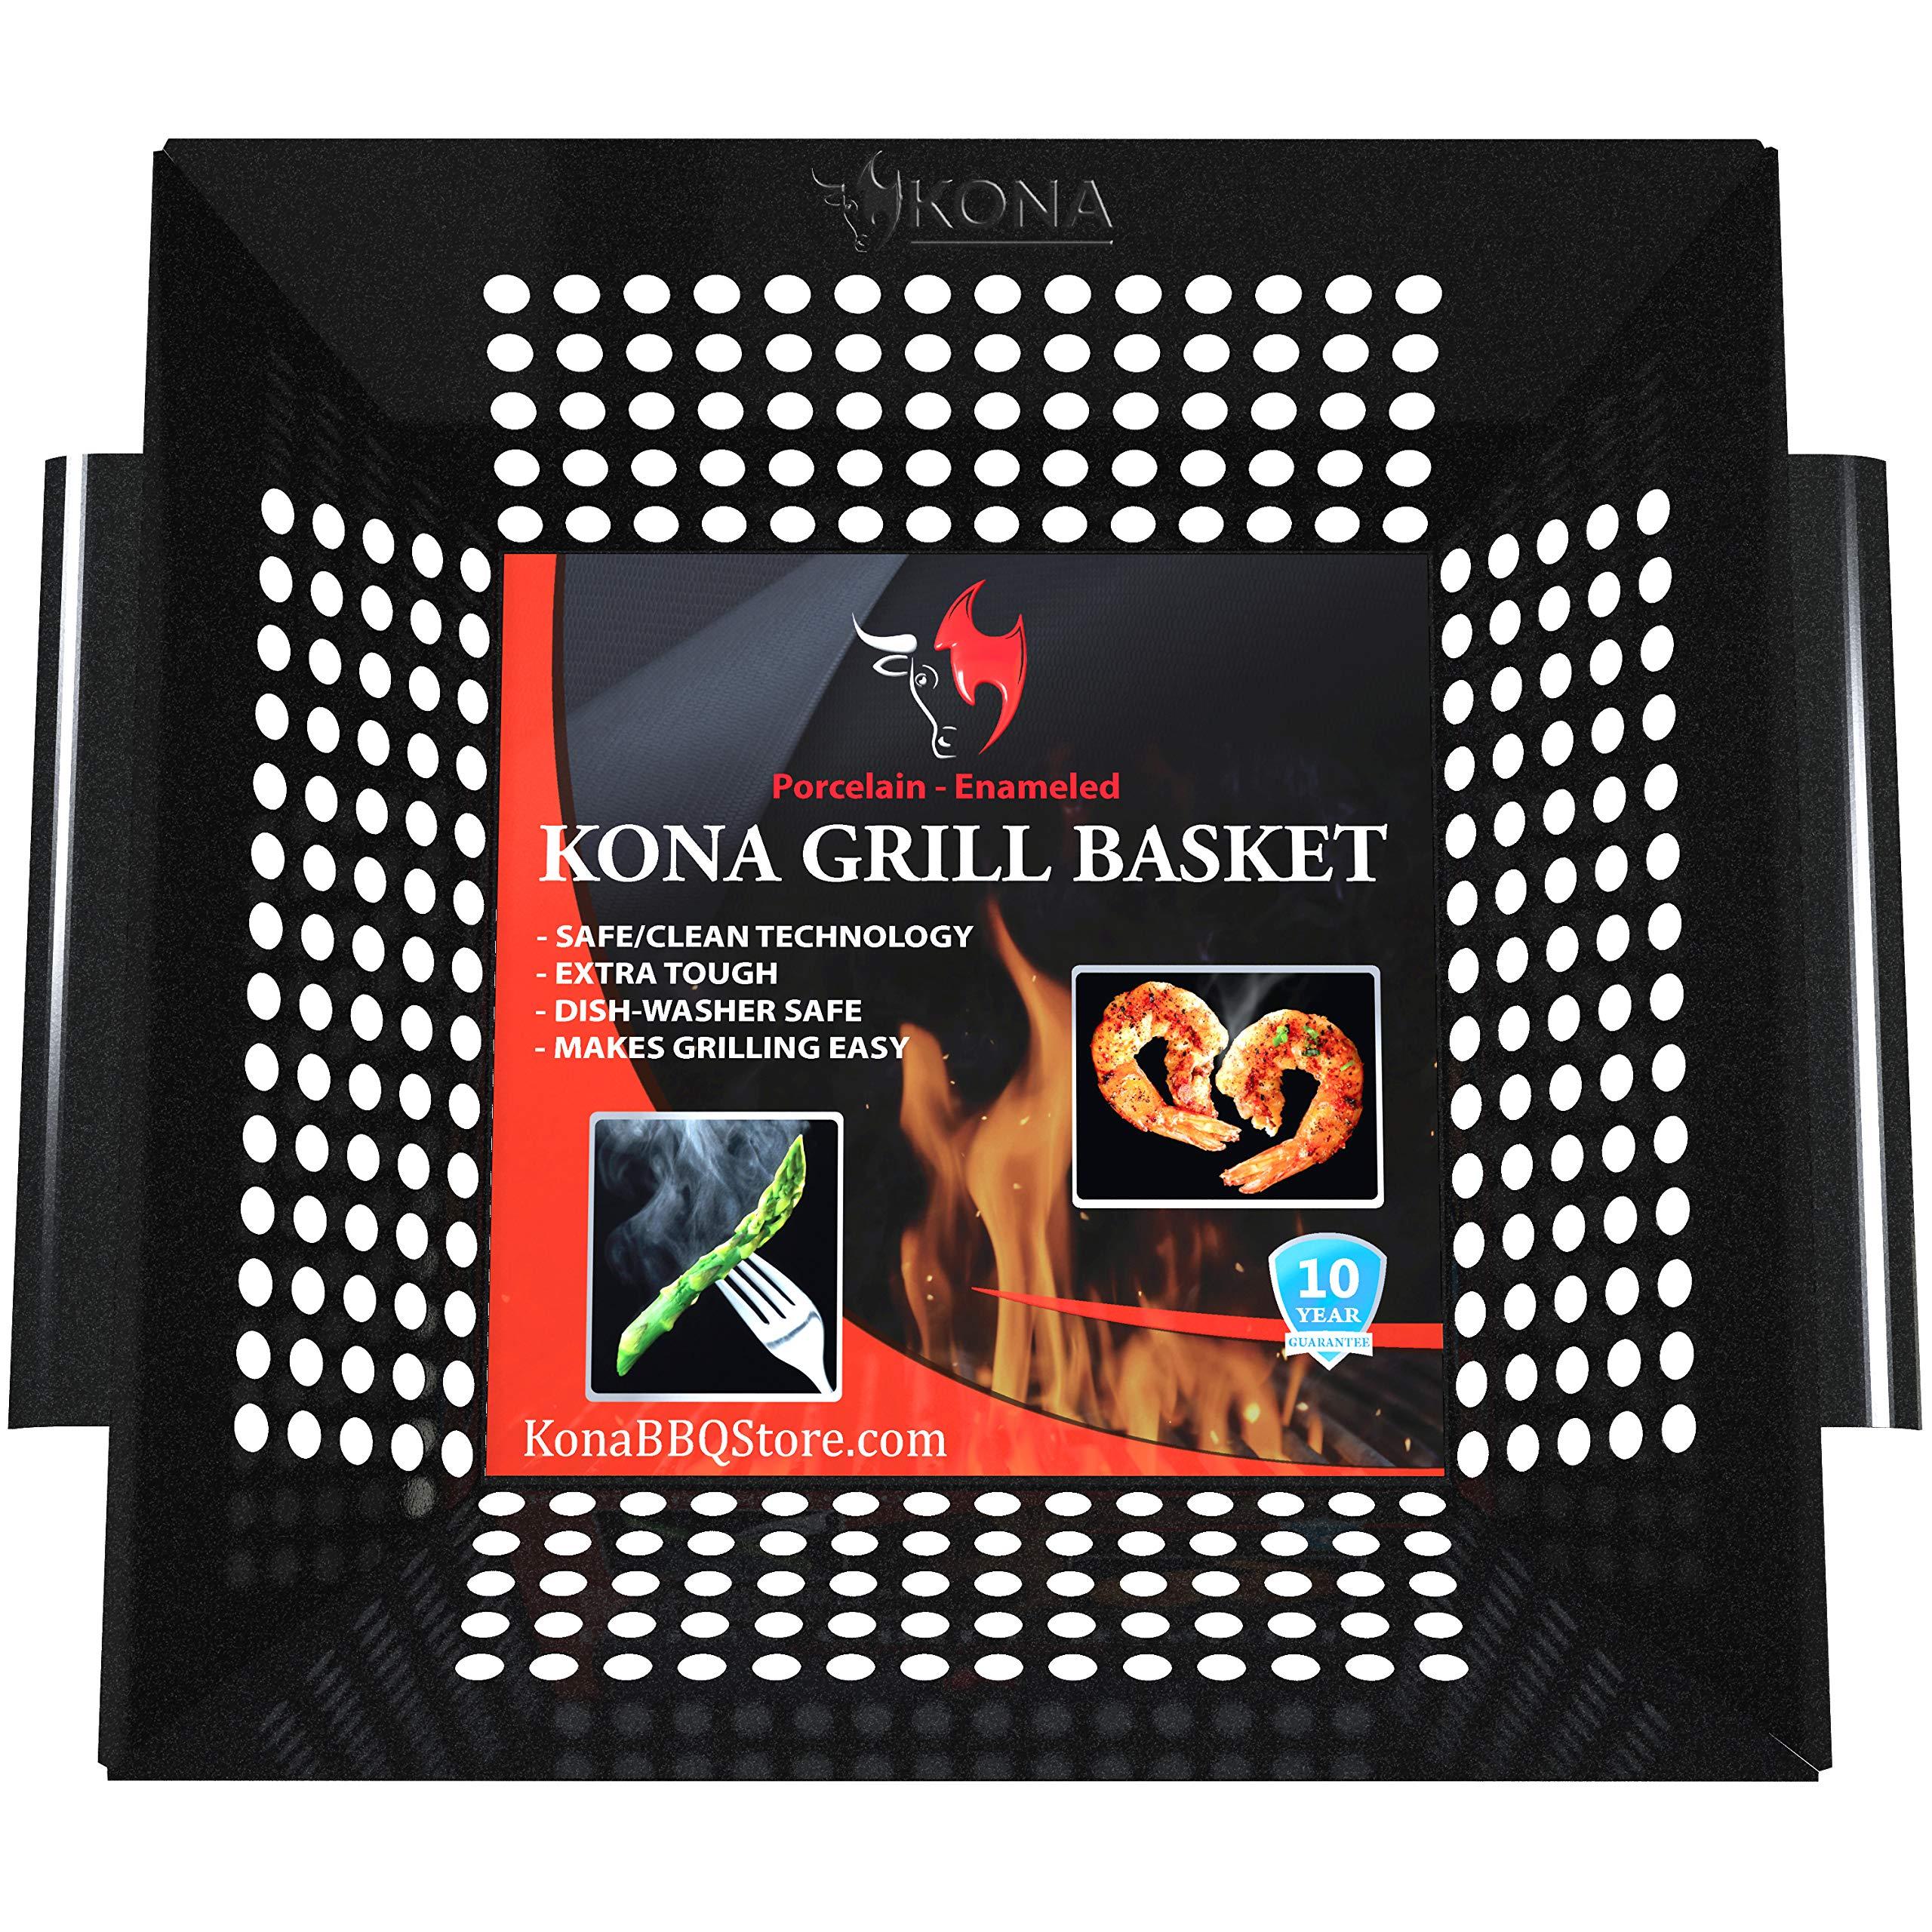 Kona Best Vegetable Grill Basket - Safe/Clean Porcelain Enameled BBQ Grilling Basket (Large 12''x12'') for Veggies, Kabobs, Seafood, Meats - 10 Year Guarantee